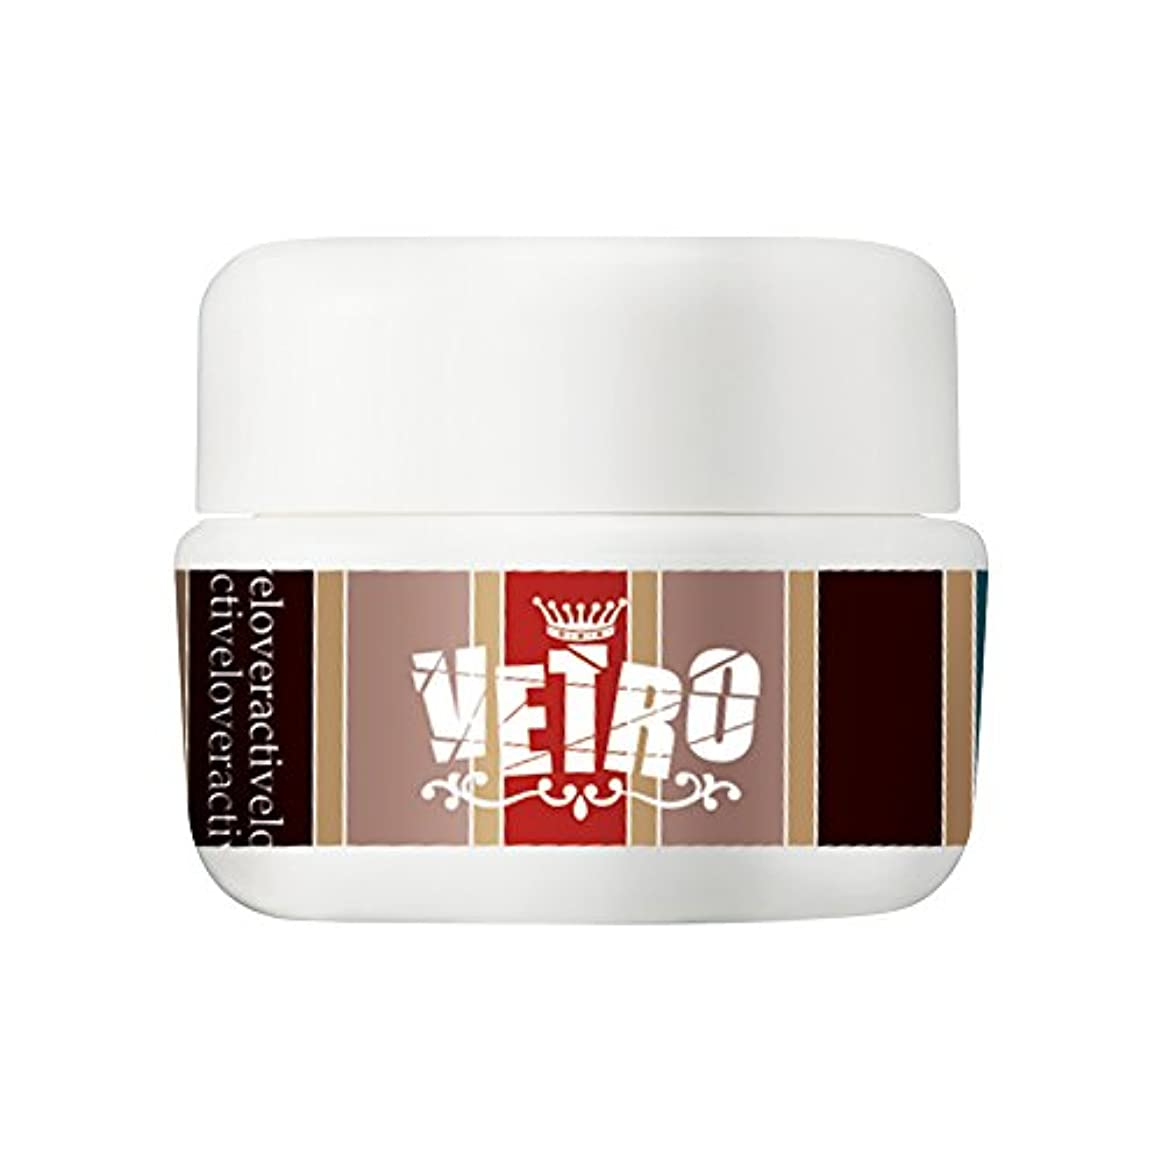 VETRO カラージェル VL390 ビリジアン 5ml UV/LED対応